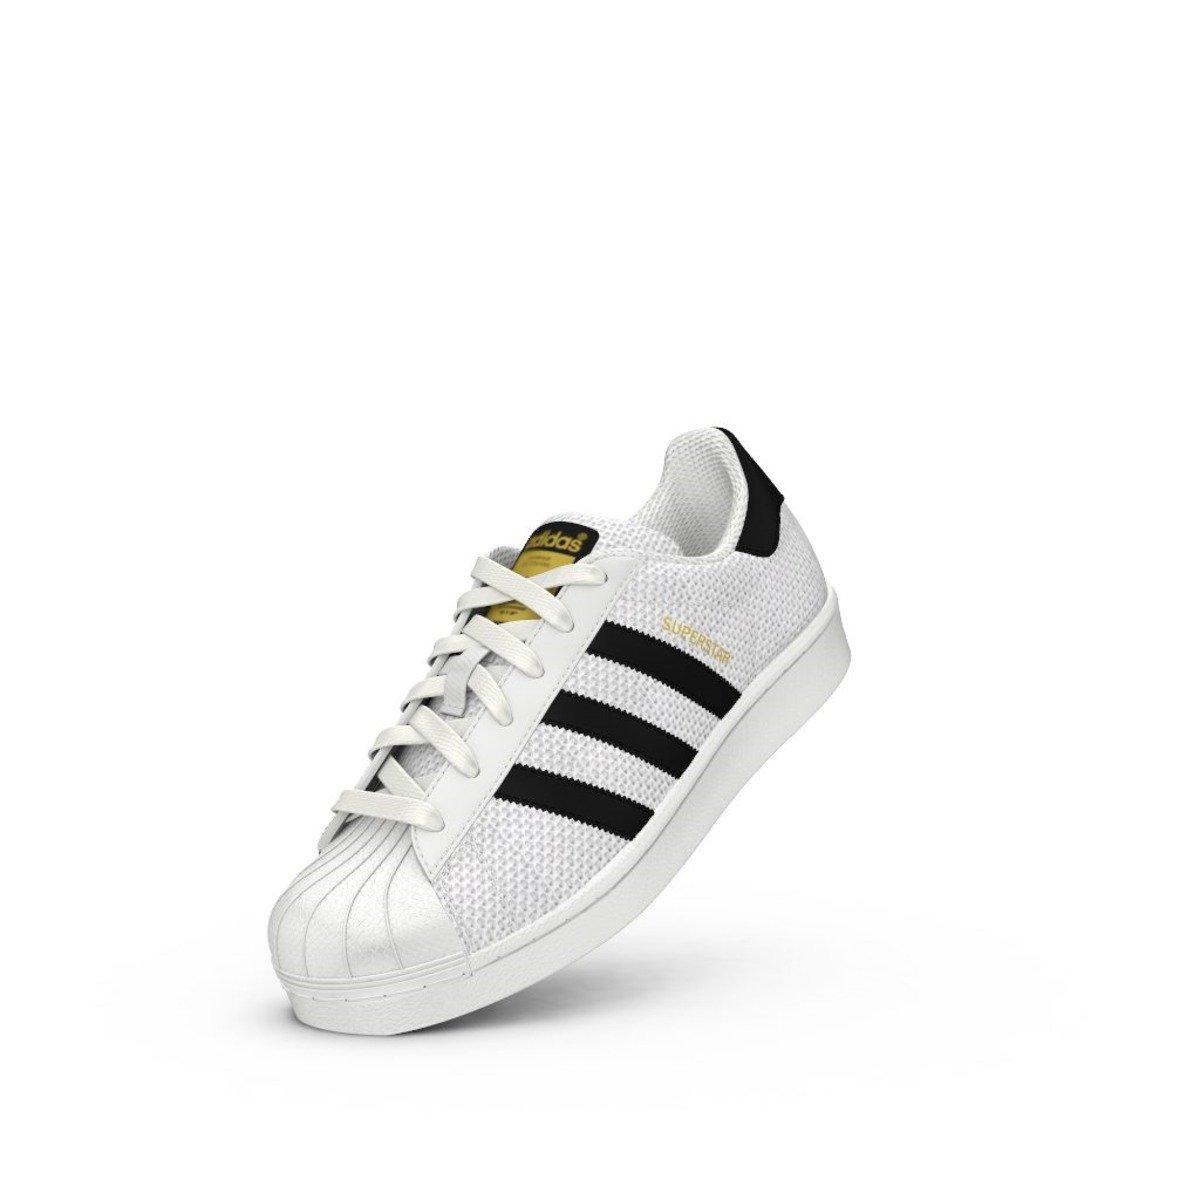 adidas superstar junior shoes s76622 basketball shoes. Black Bedroom Furniture Sets. Home Design Ideas